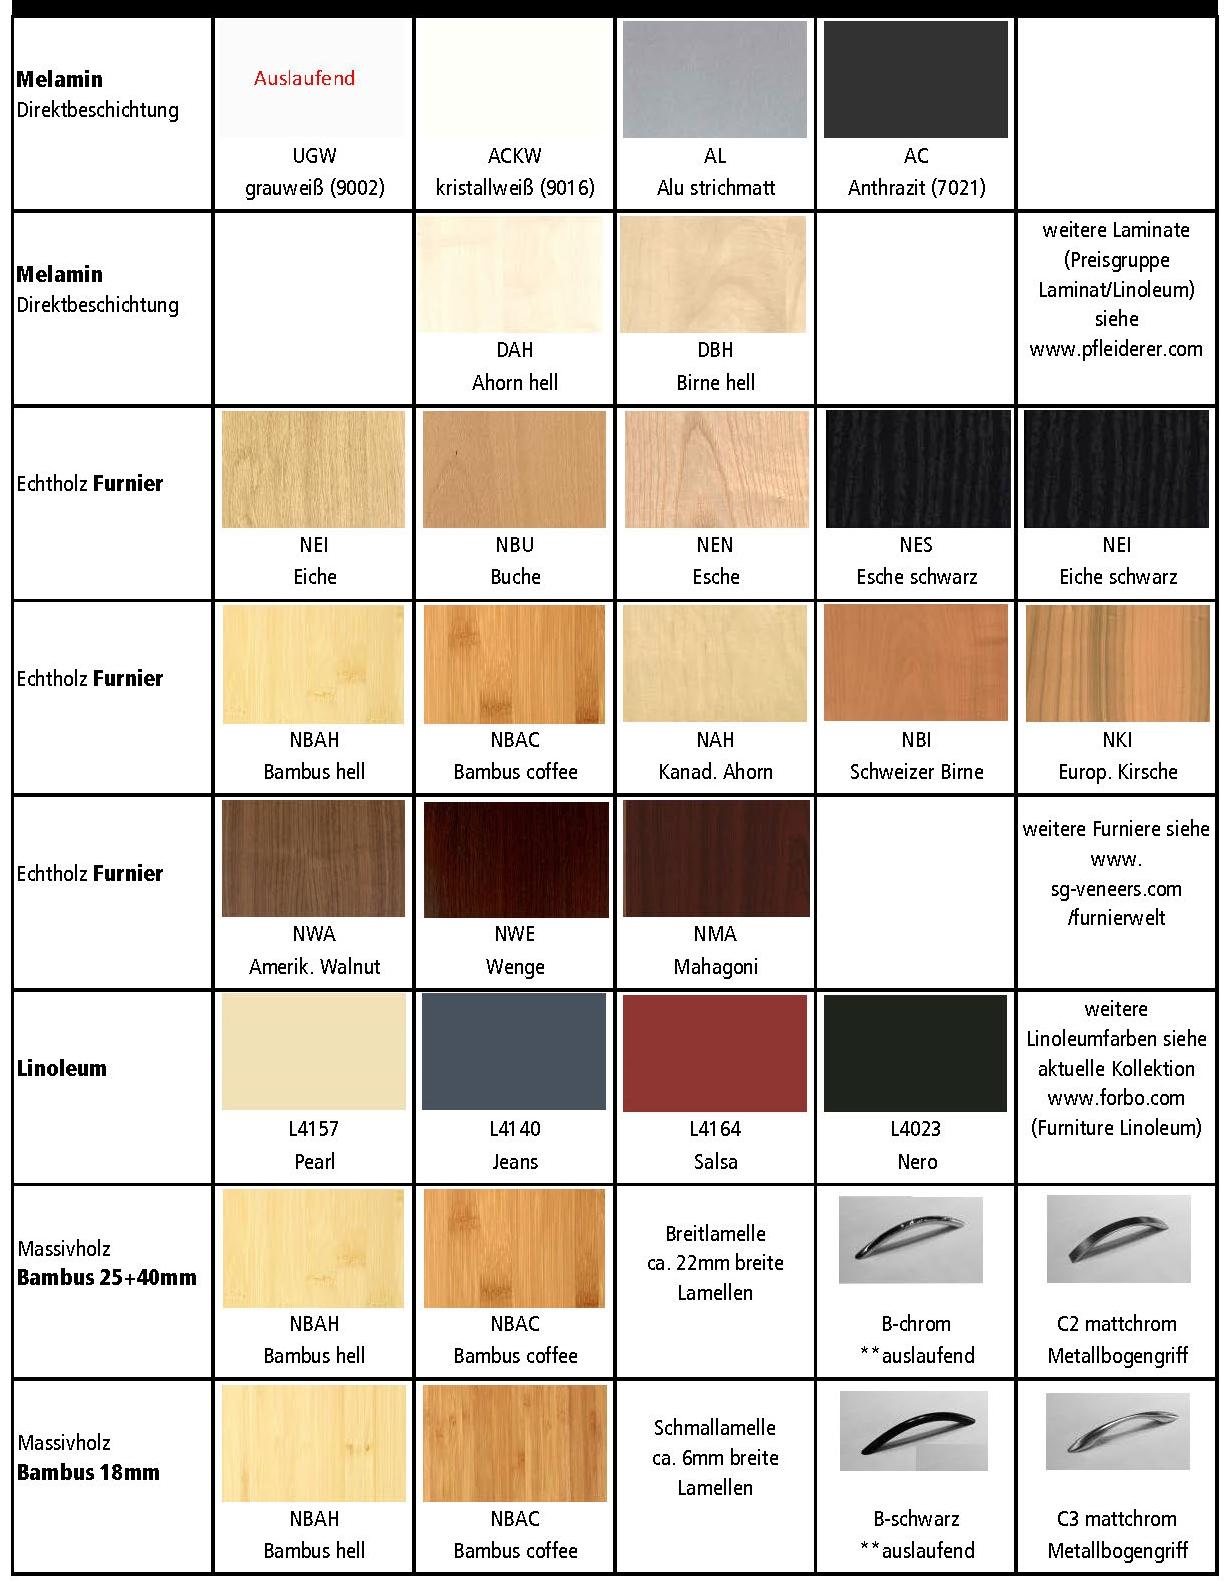 Laminat farben tabelle  Variconferenz - Variable Konferenztische als Ellipse oder ...